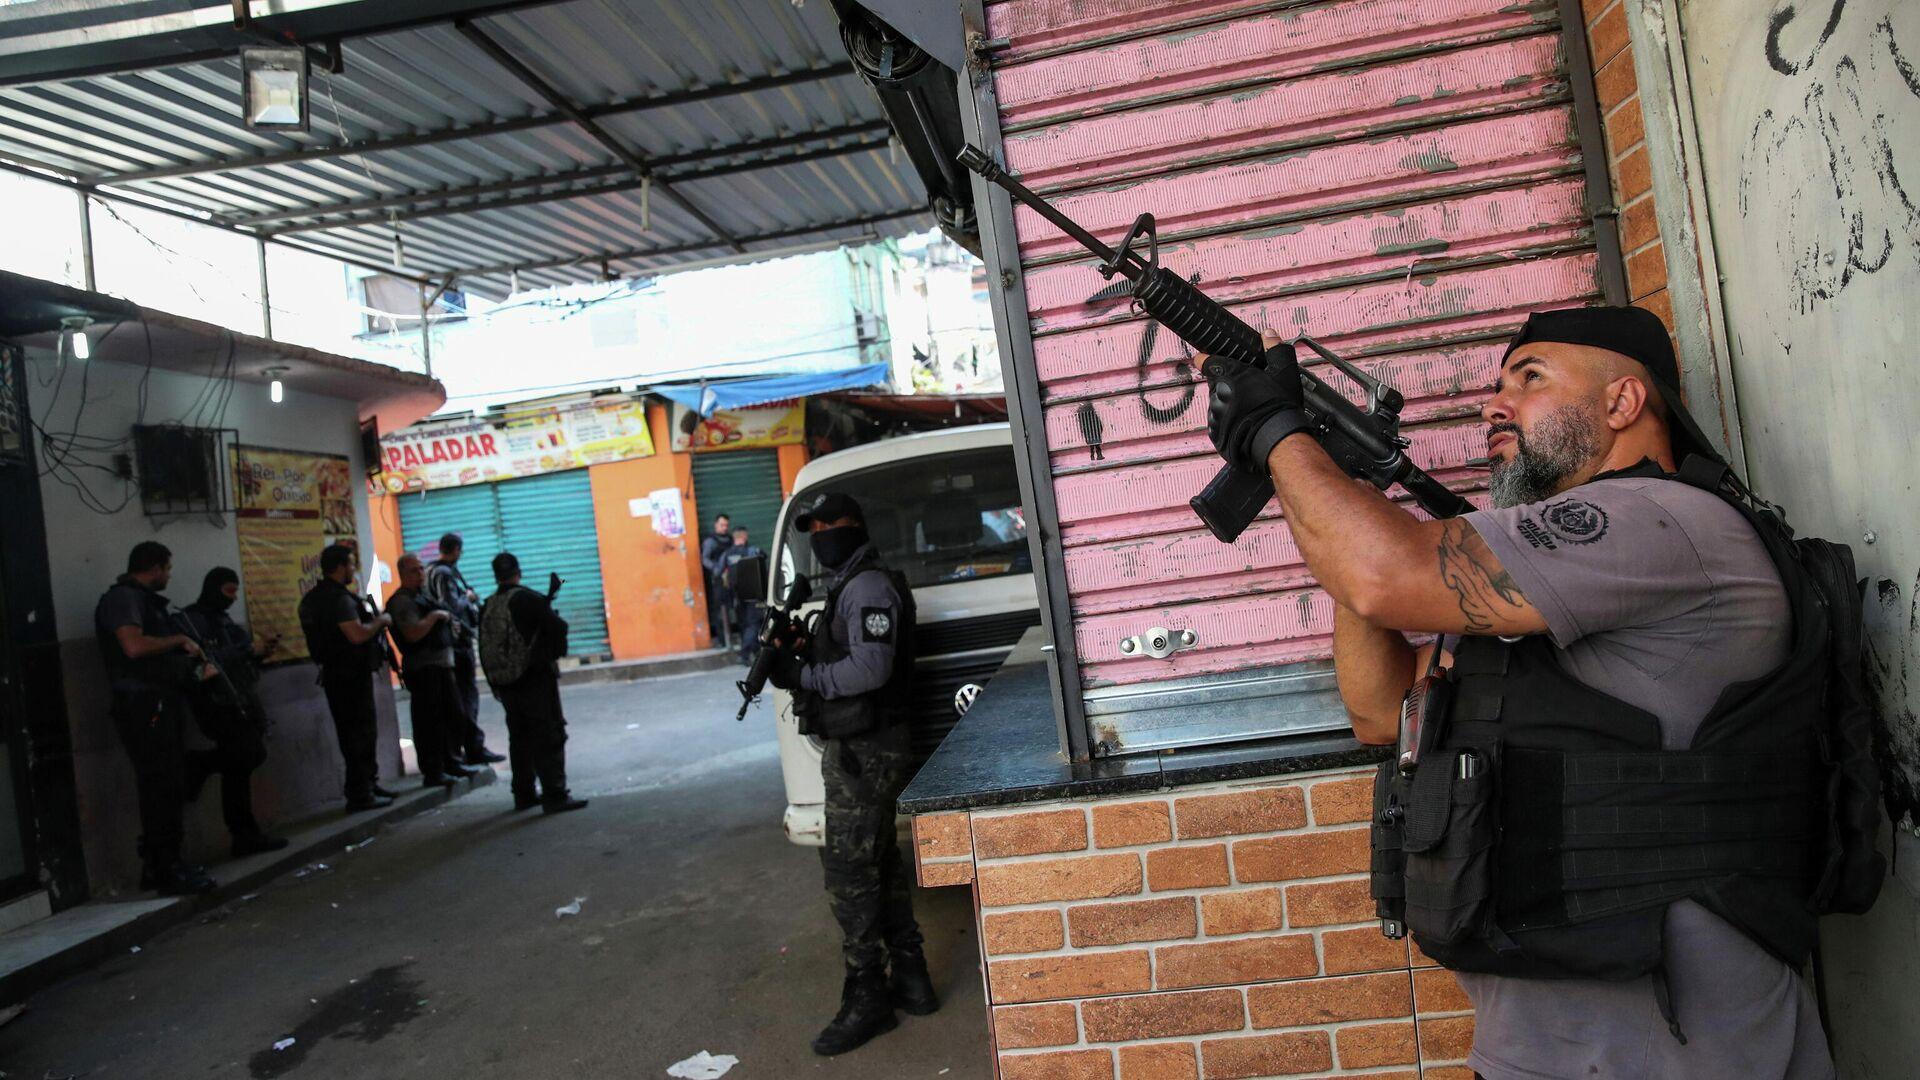 Policía de Río en favela - Sputnik Mundo, 1920, 06.05.2021